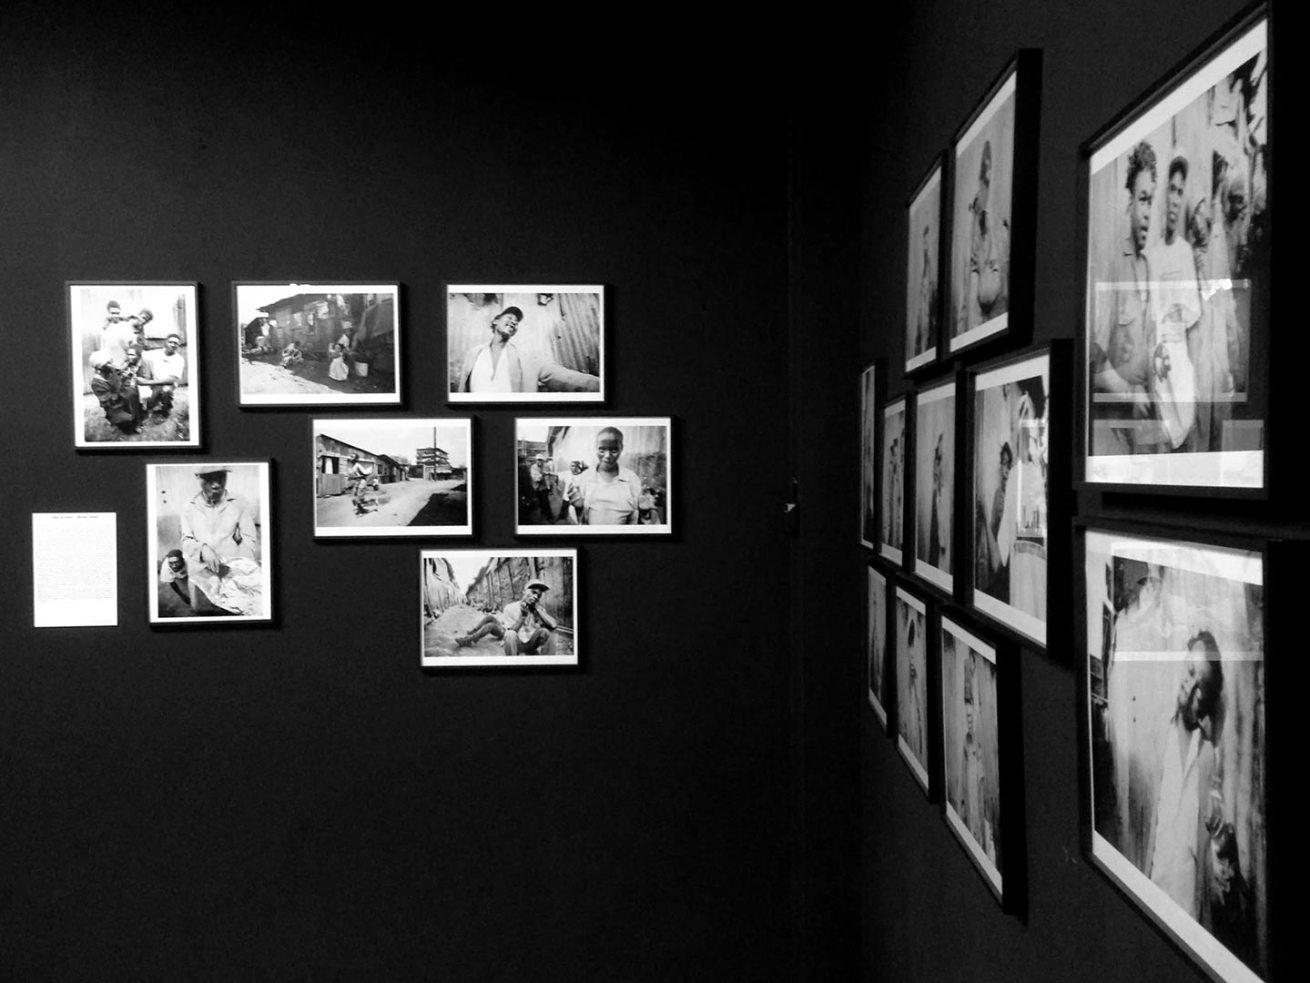 1/2 douzaine photographique brief insight, Urban suvivors exhibition